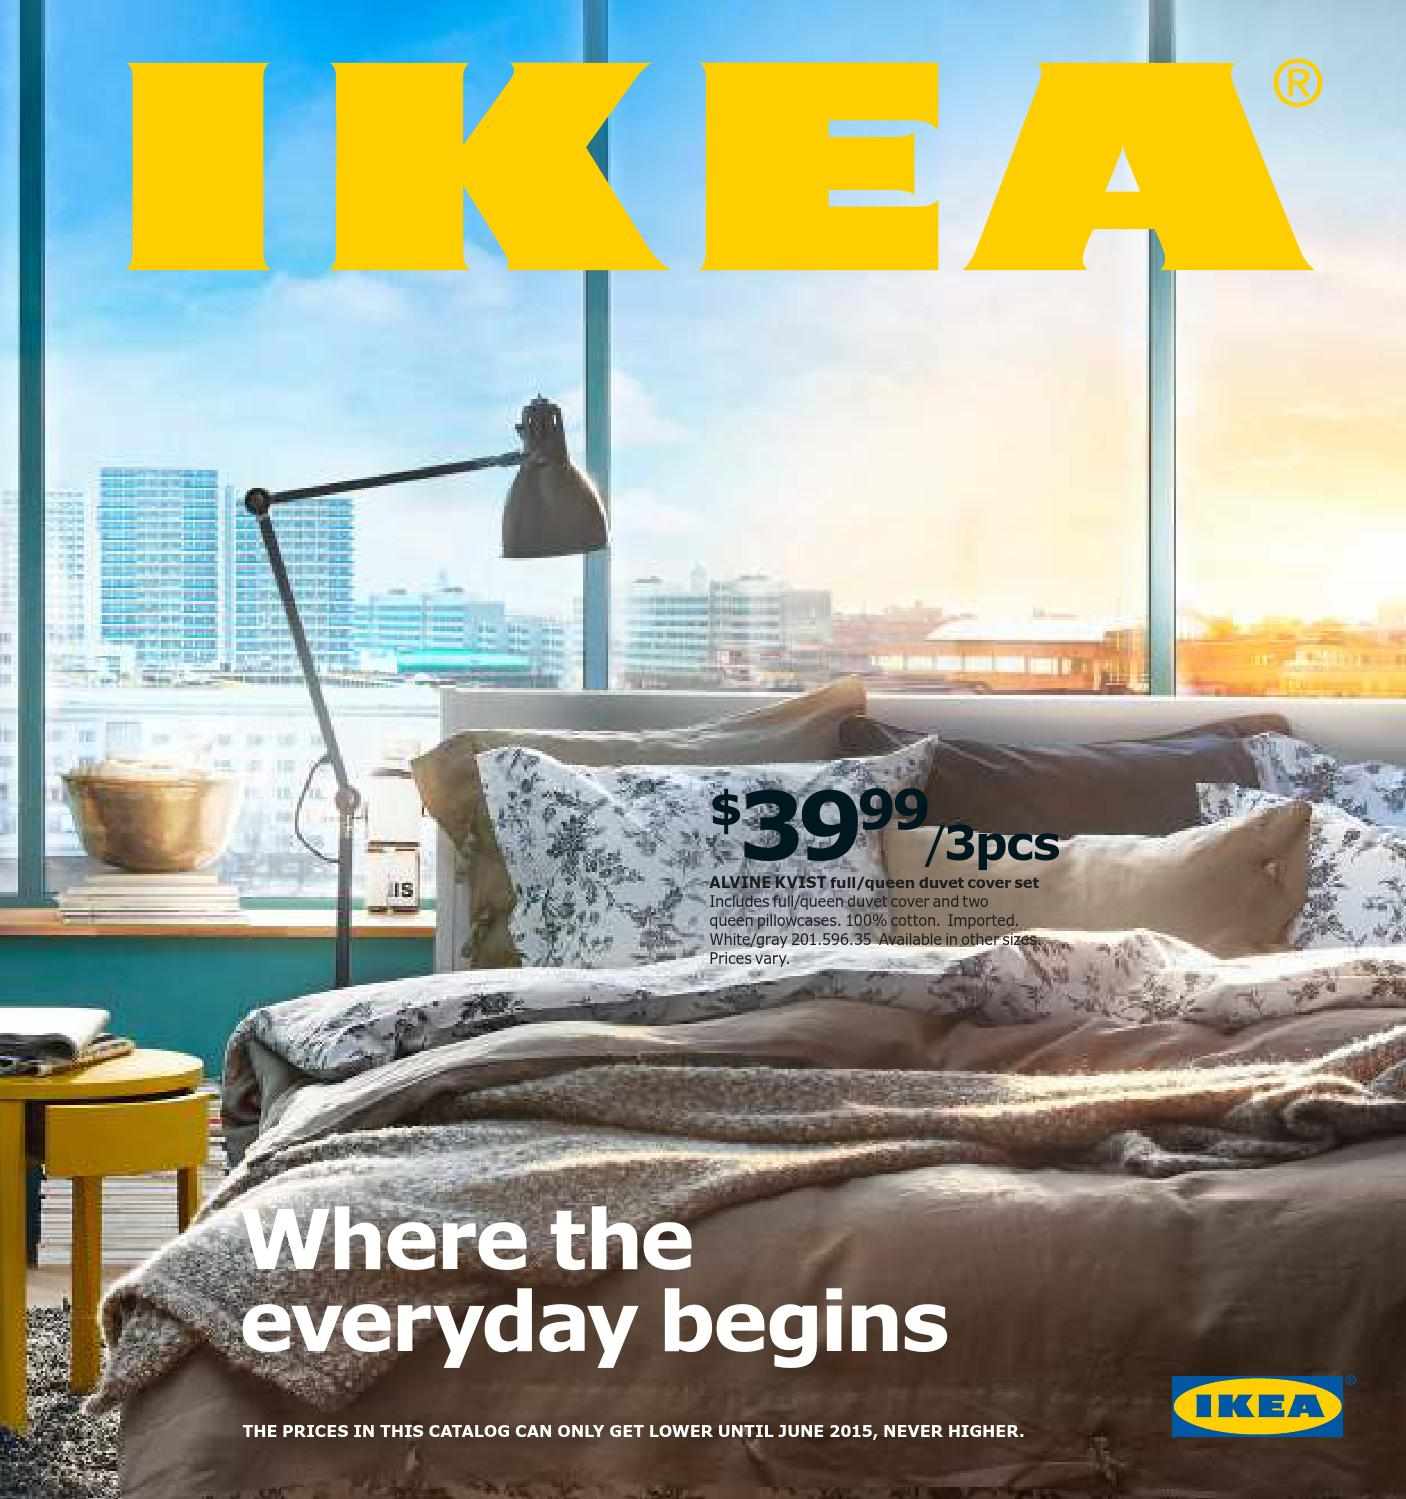 Ikea katalog 2015 by Vsikatalogi issuu